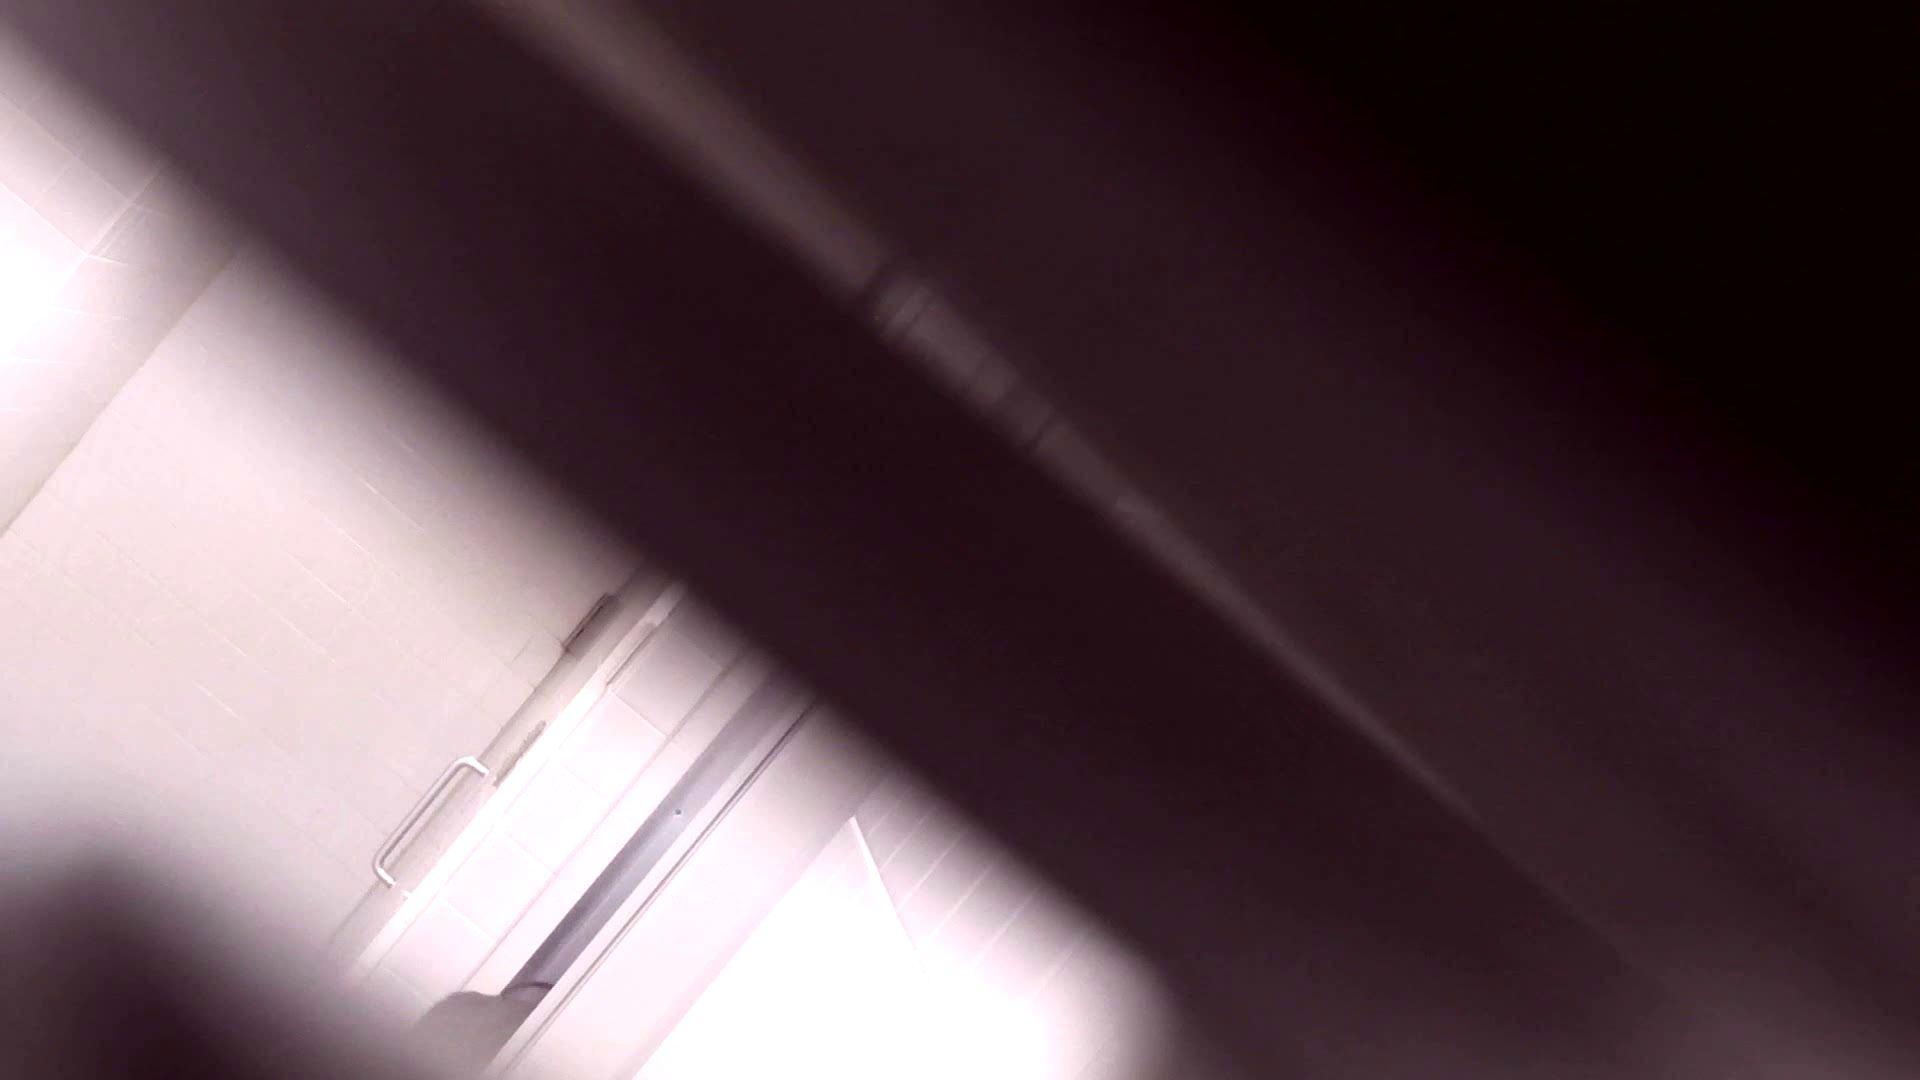 vol.15 命がけ潜伏洗面所! 肌荒れ注意報!! プライベート | 洗面所  55pic 33